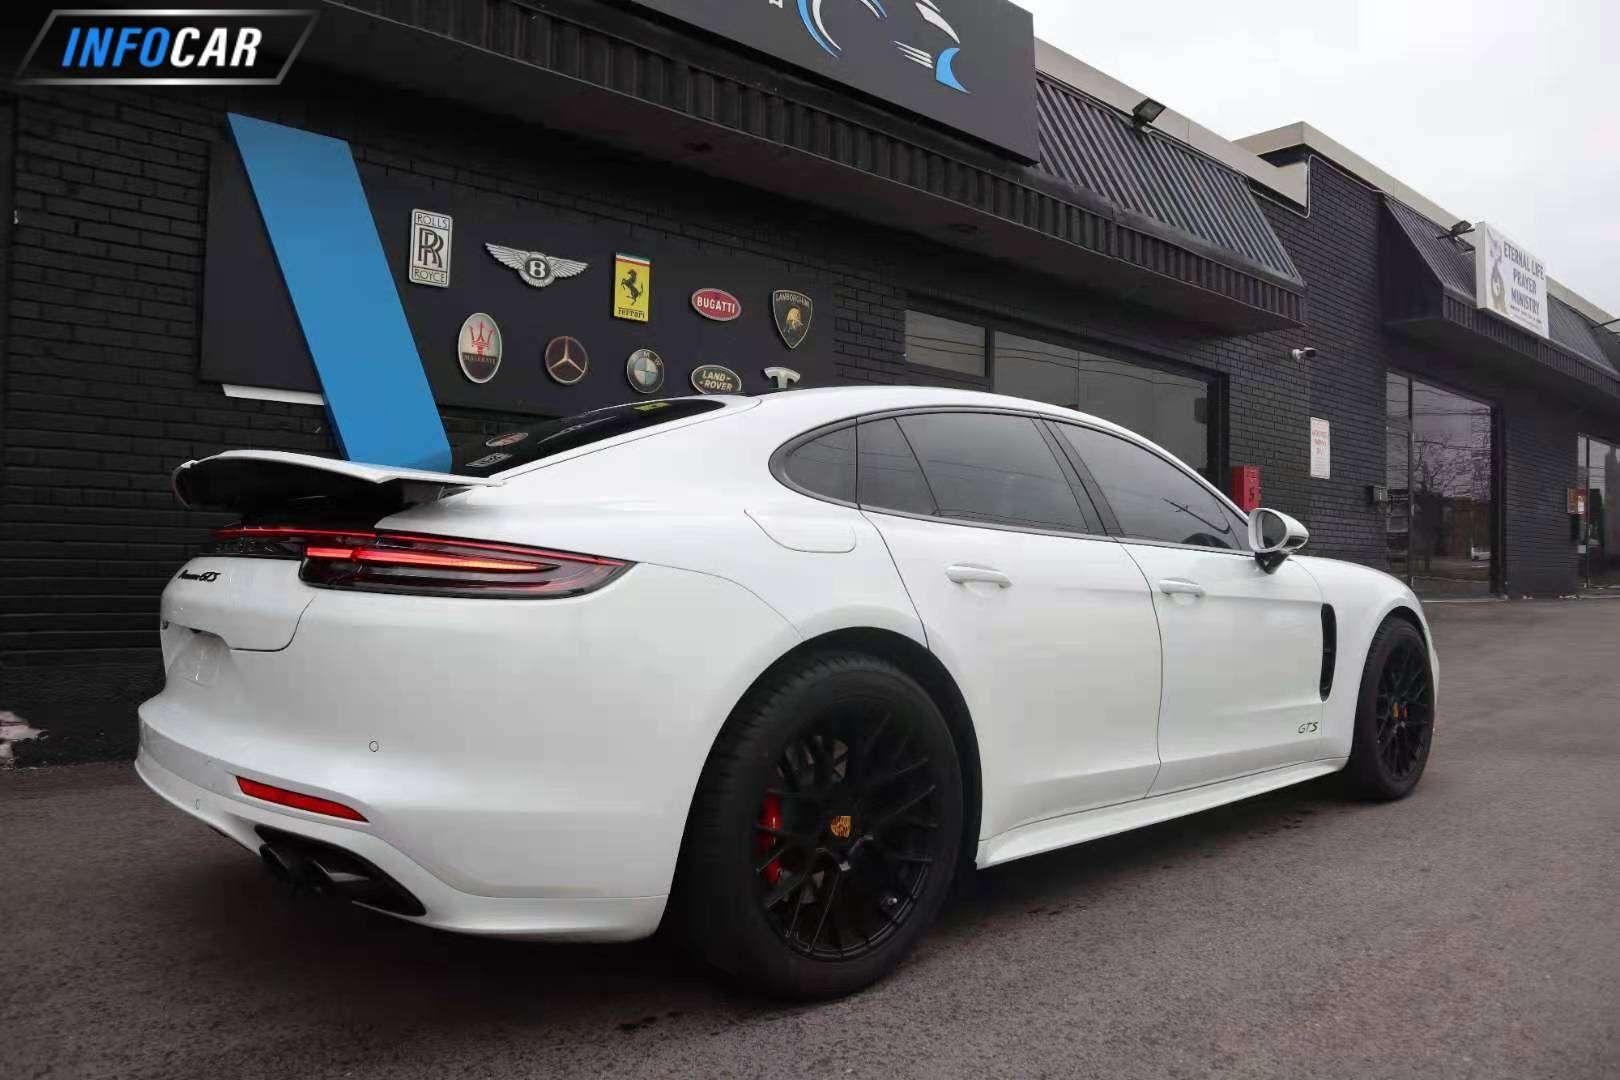 2019 Porsche Panamera Panamera GTS - INFOCAR - Toronto's Most Comprehensive New and Used Auto Trading Platform